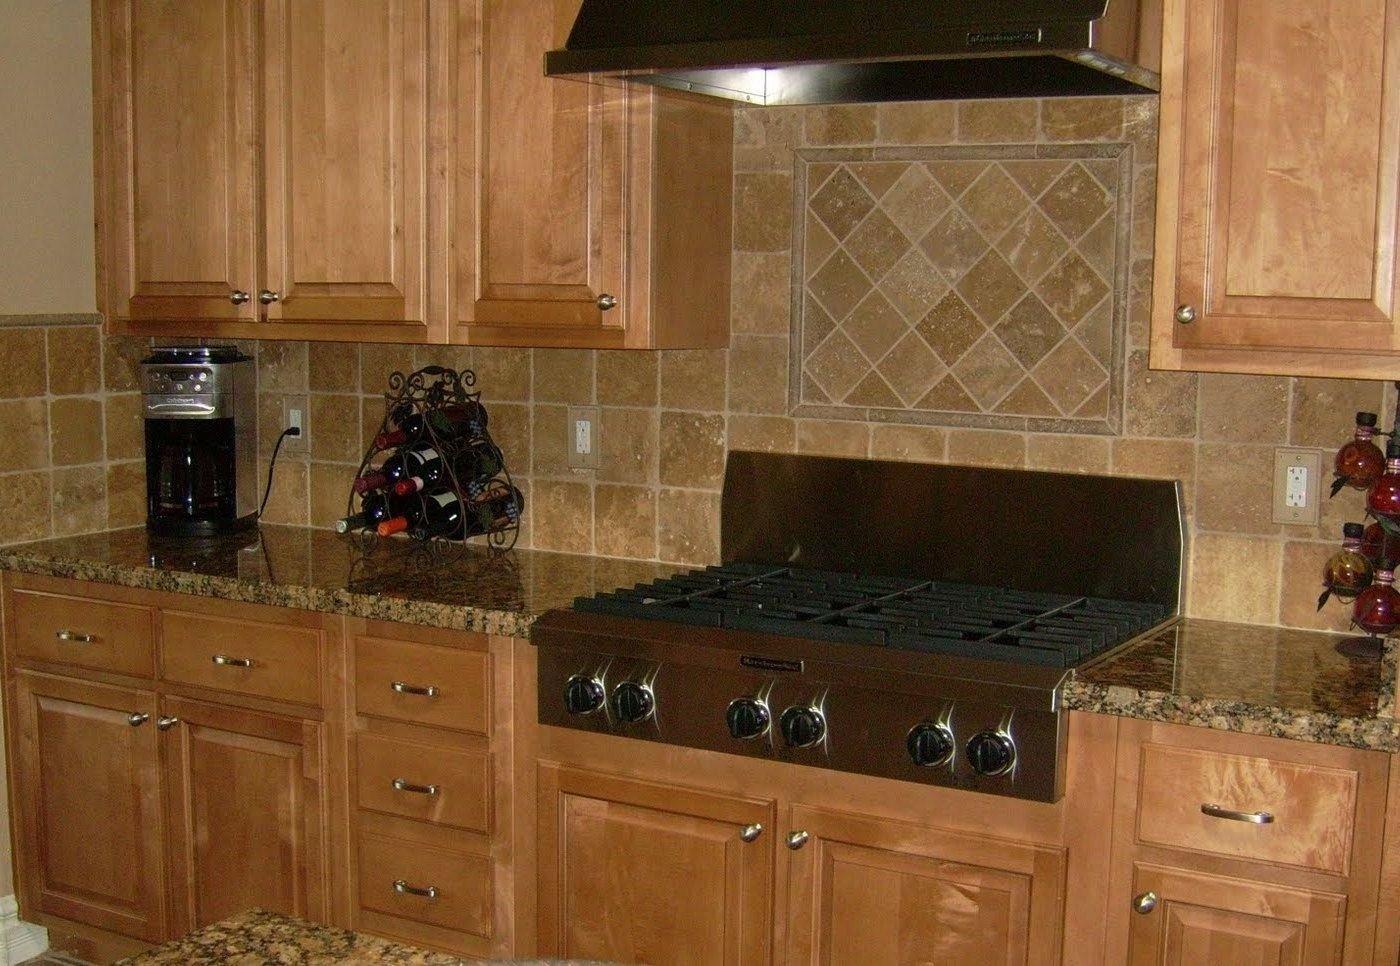 10 Gorgeous Backsplash Ideas For Black Granite Countertops kitchen backsplash ideas black granite countertops wooden stained 2020